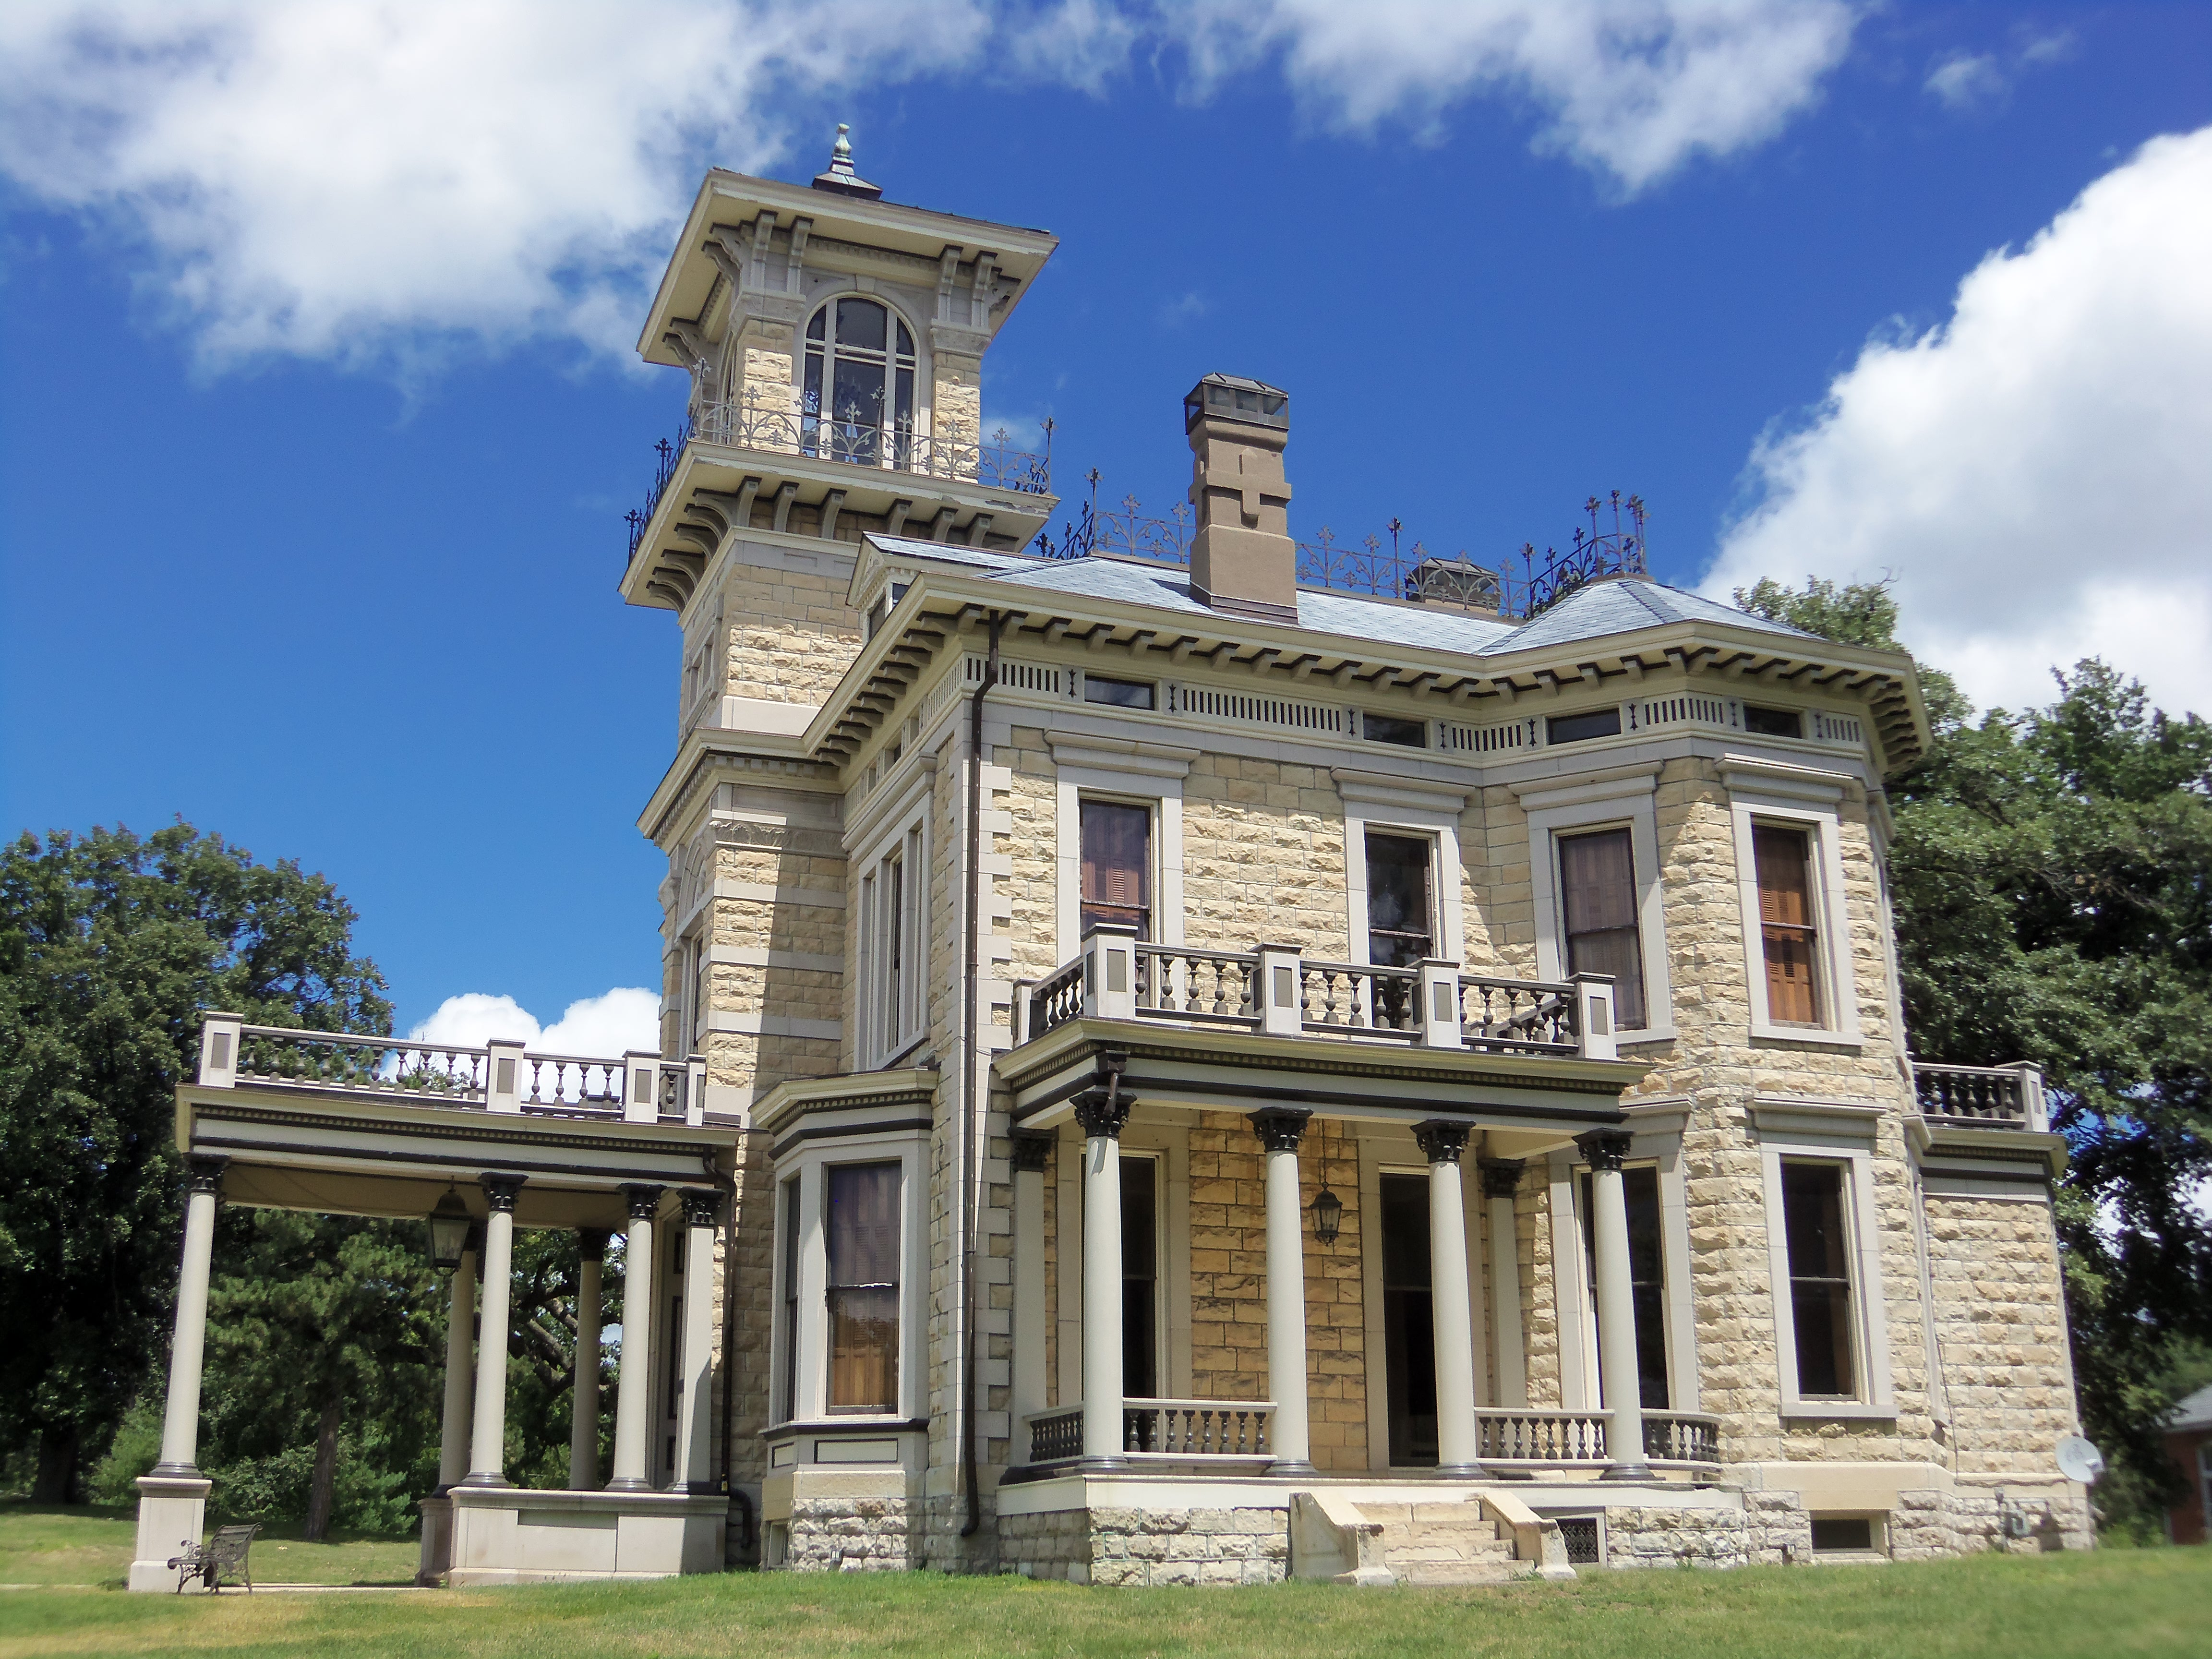 Iowa Part 2 >> File:Renwick Mansion Davenport, Iowa.jpg - Wikimedia Commons